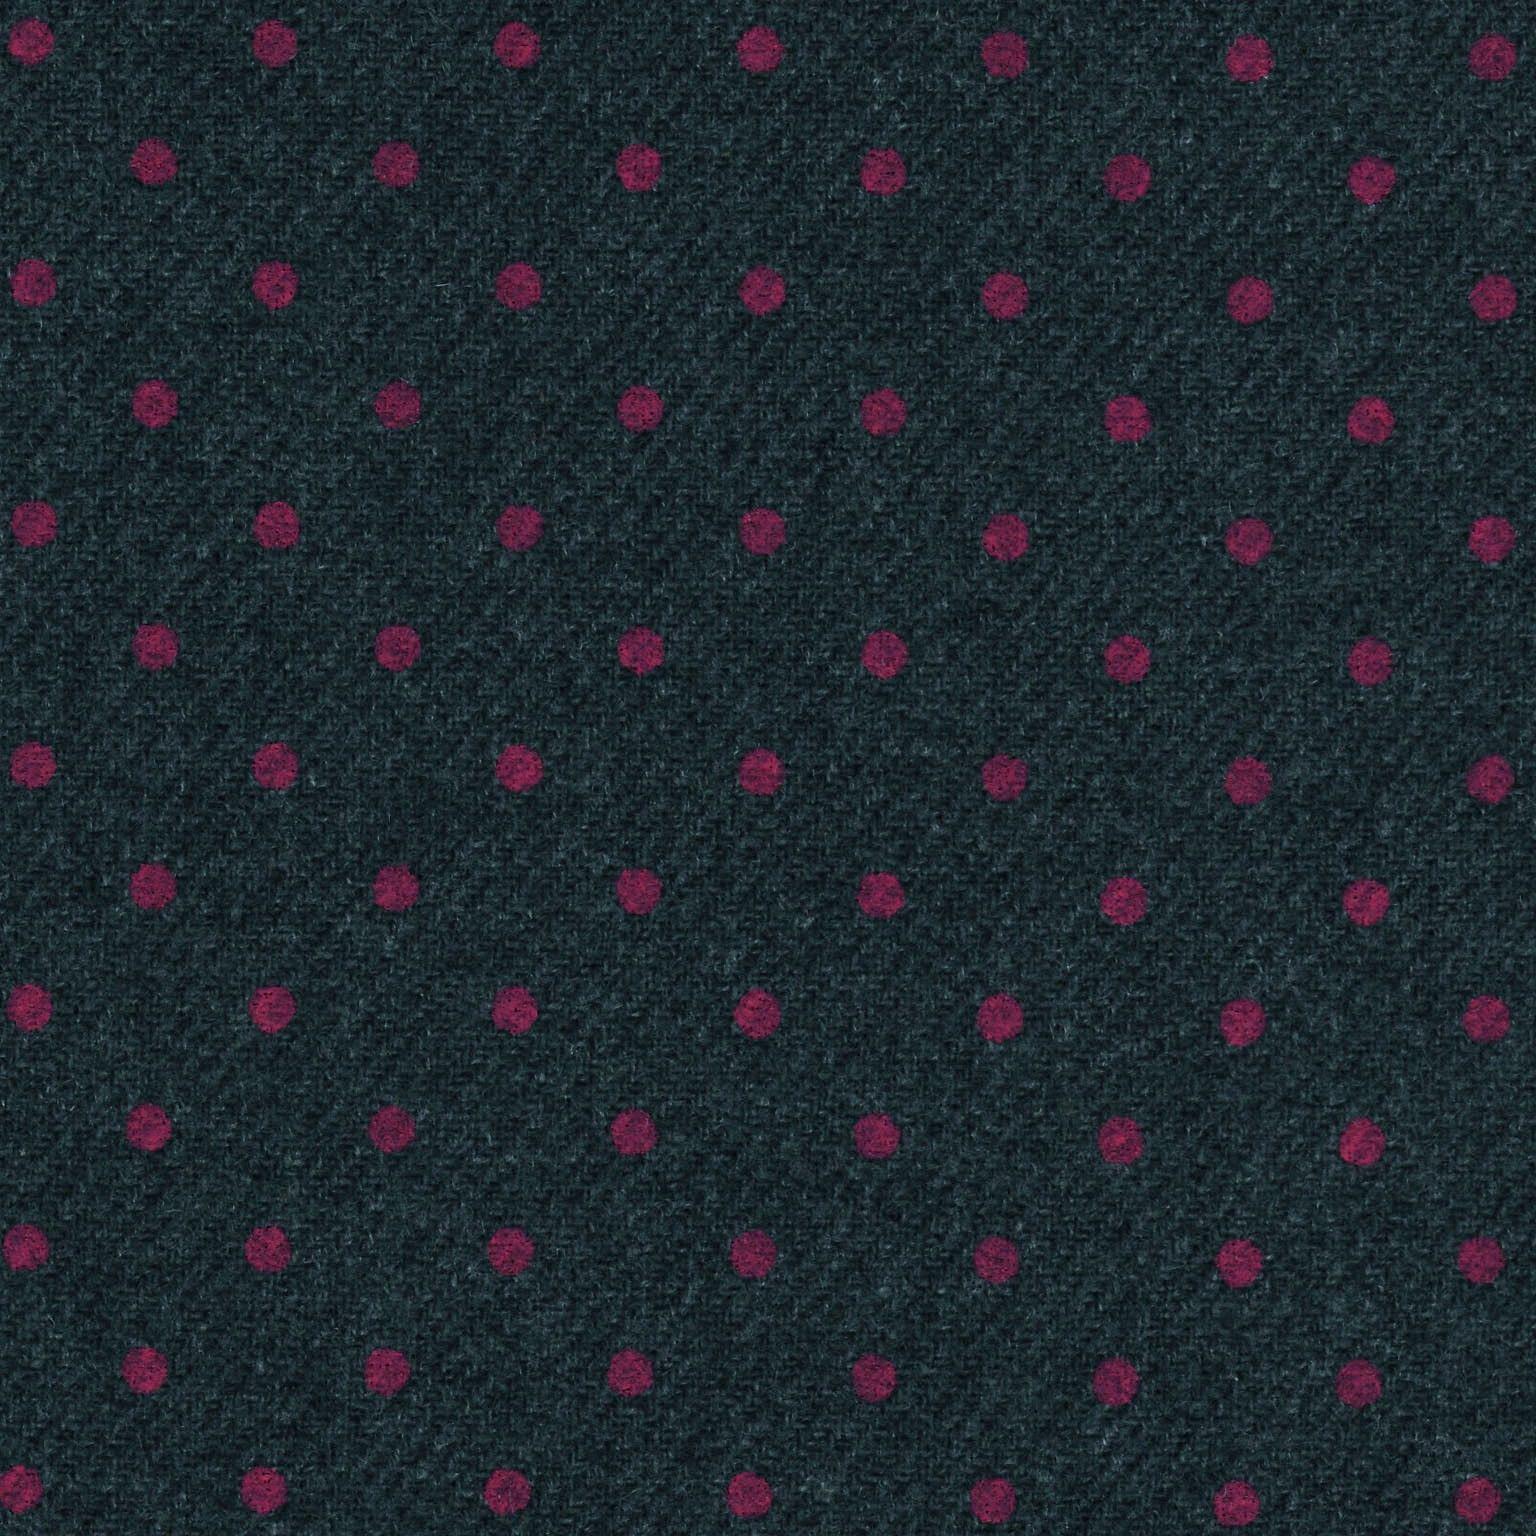 Fabric+lana+grigia+con+pois+fucsia+x+50cm